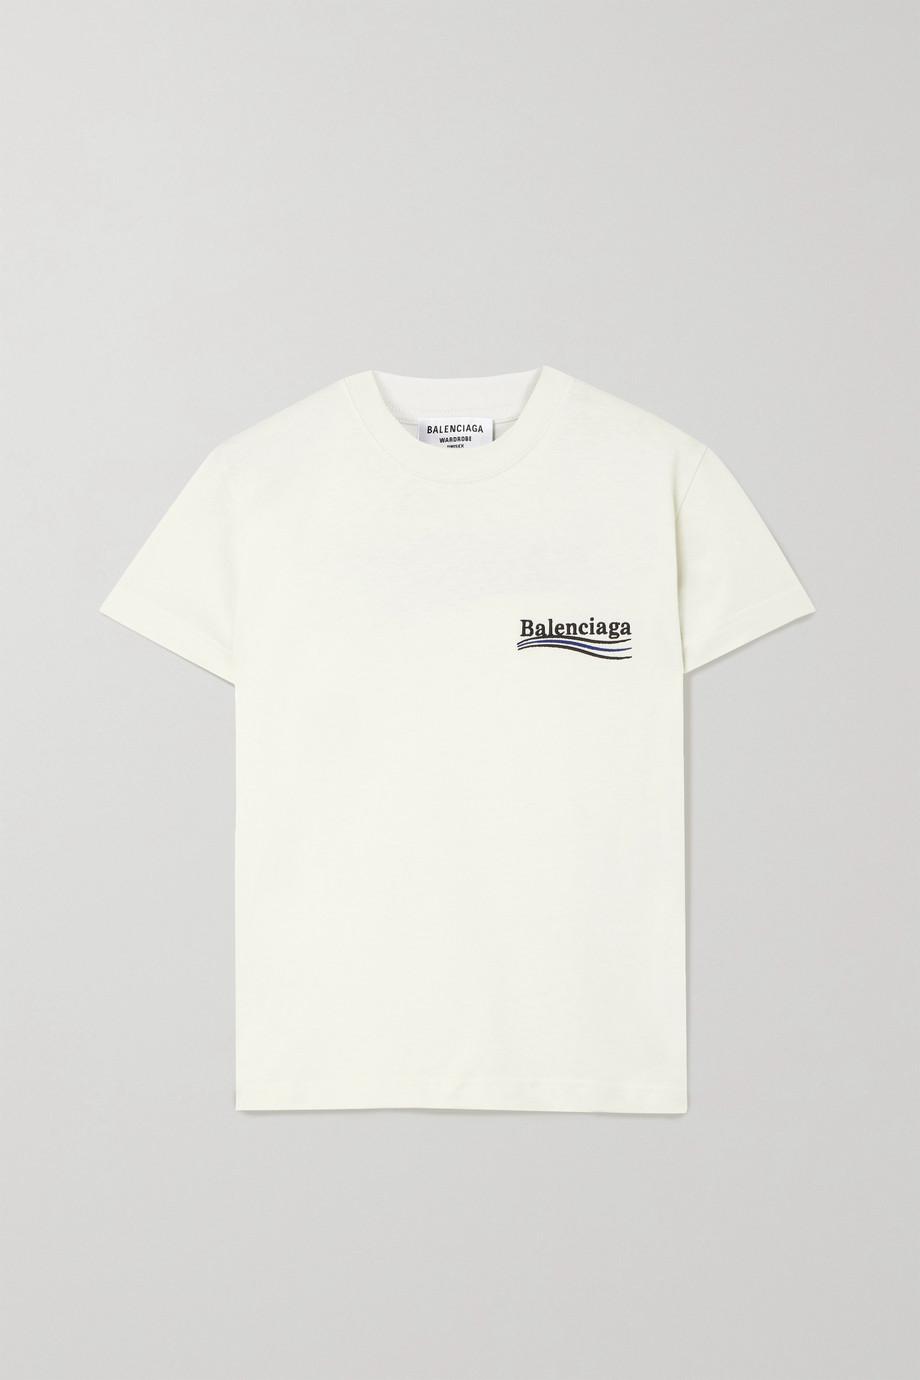 Balenciaga Embroidered cotton-jersey T-shirt